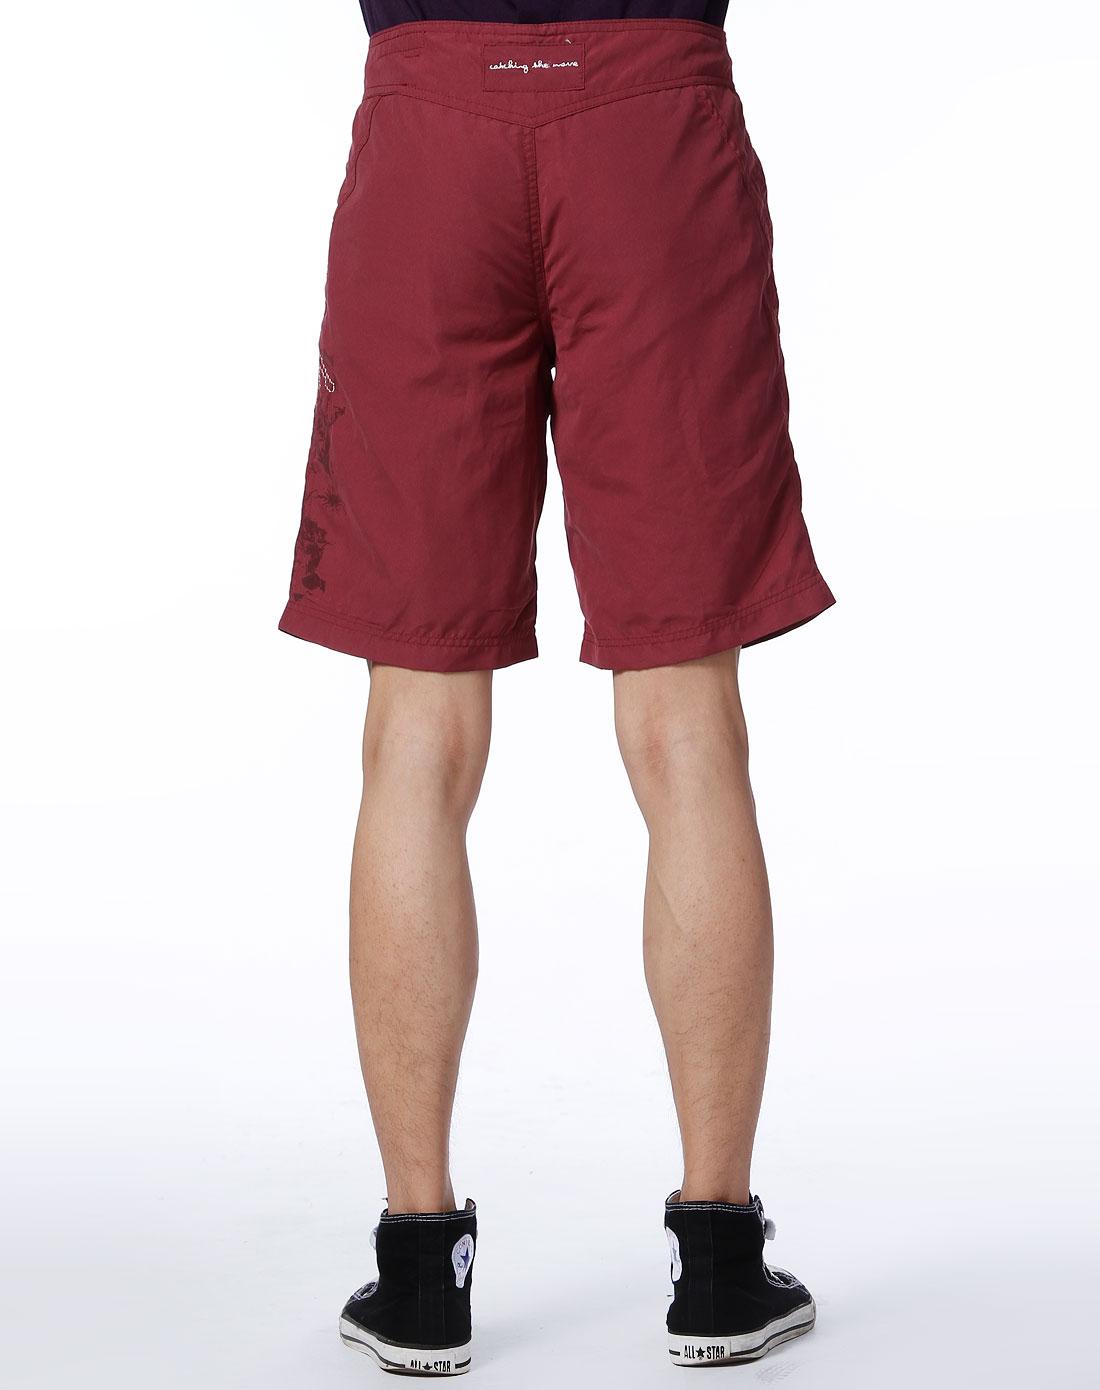 fox-男款枣红色休闲中裤